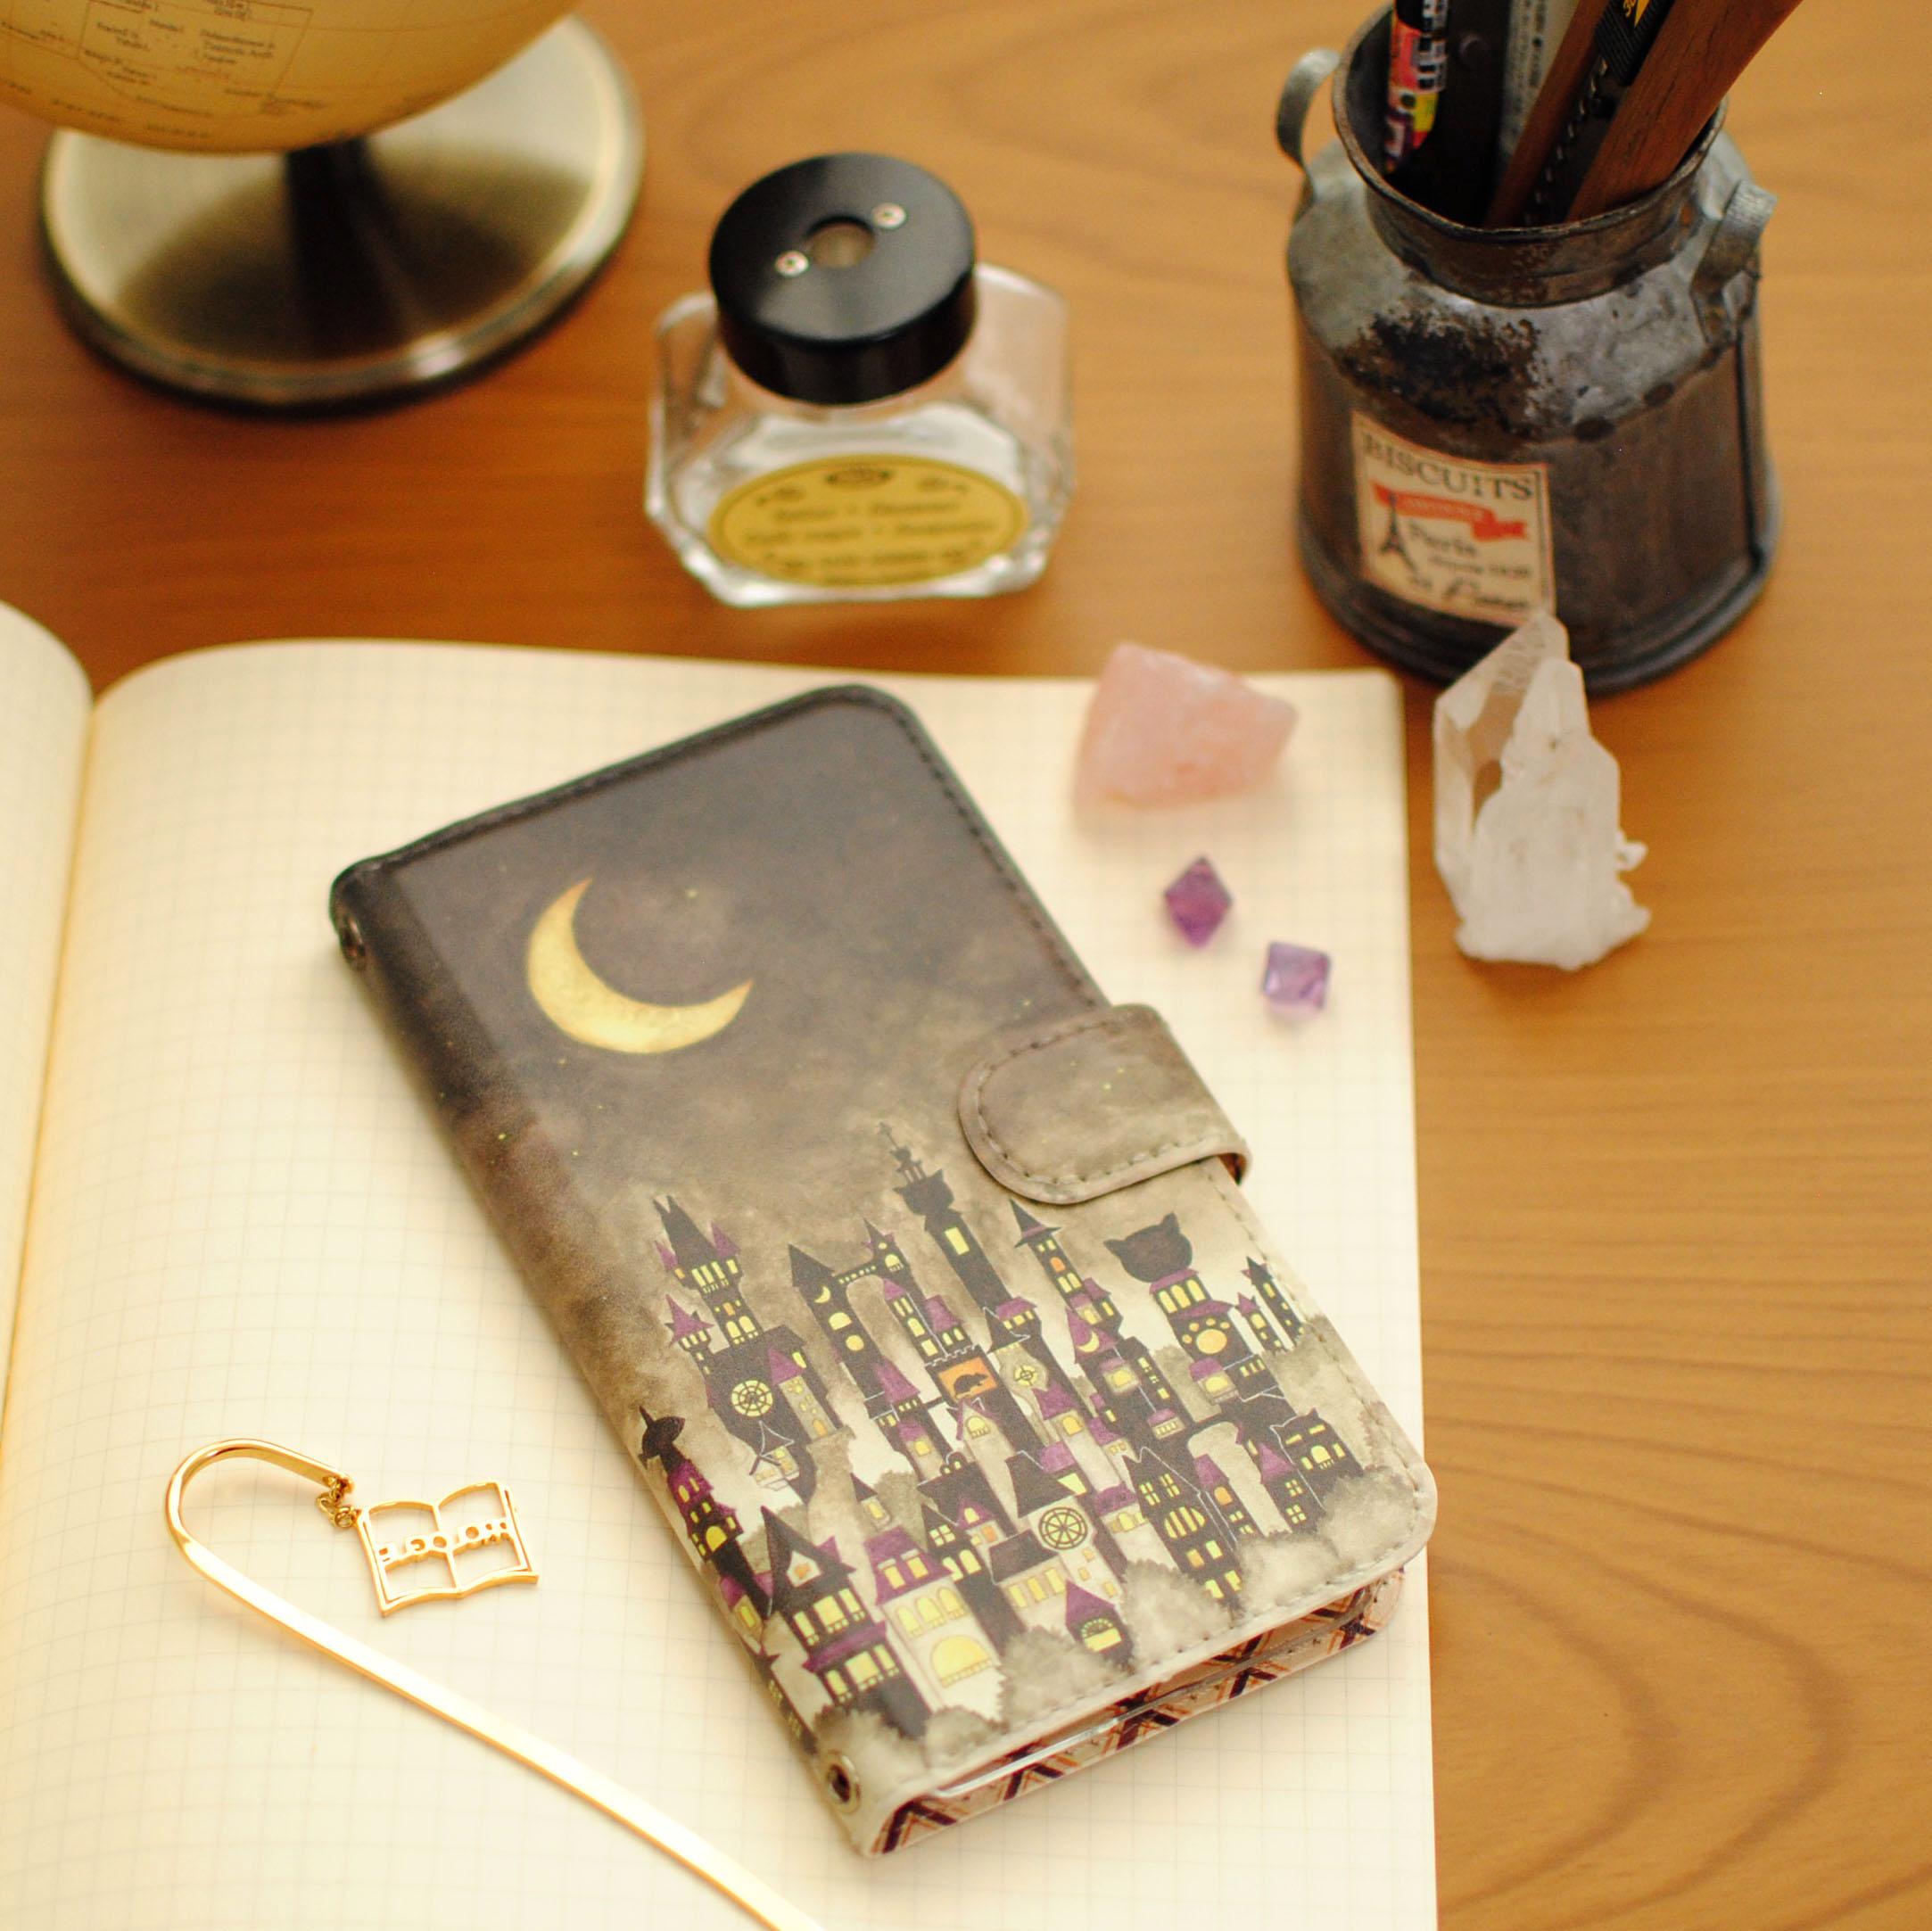 iPhoneSE/6s/7/8/X/Xs 手帳型iPhoneケース「黒猫と三日月の街」【内側デザイン可!】